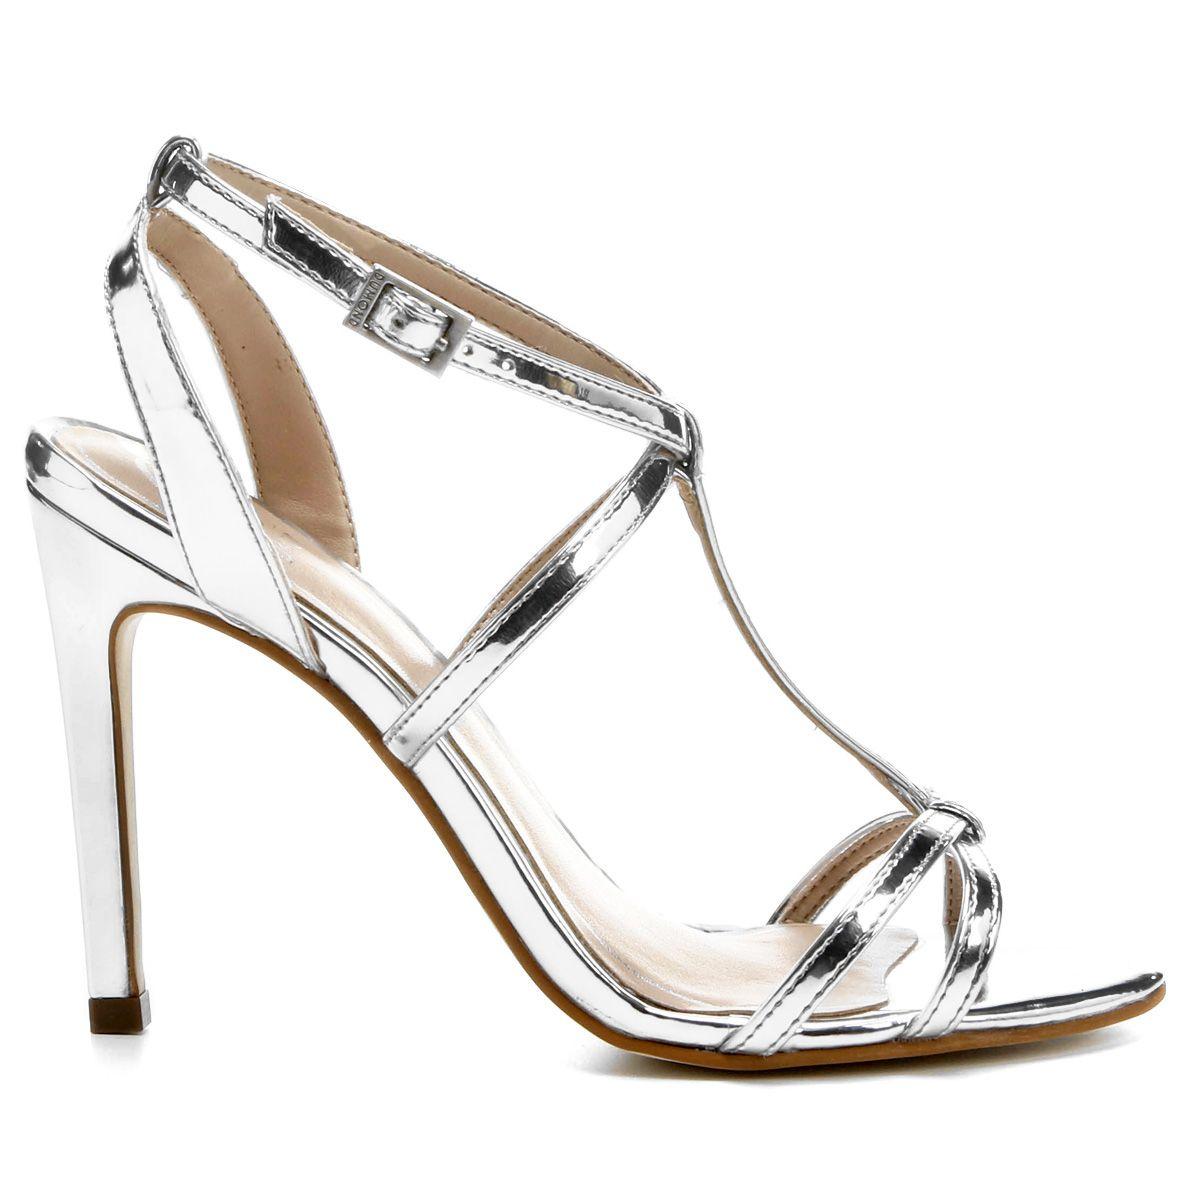 0b5086fede Compre Sandália Dumond Metalizada Salto Fino Prata na Zattini a nova loja  de moda online da